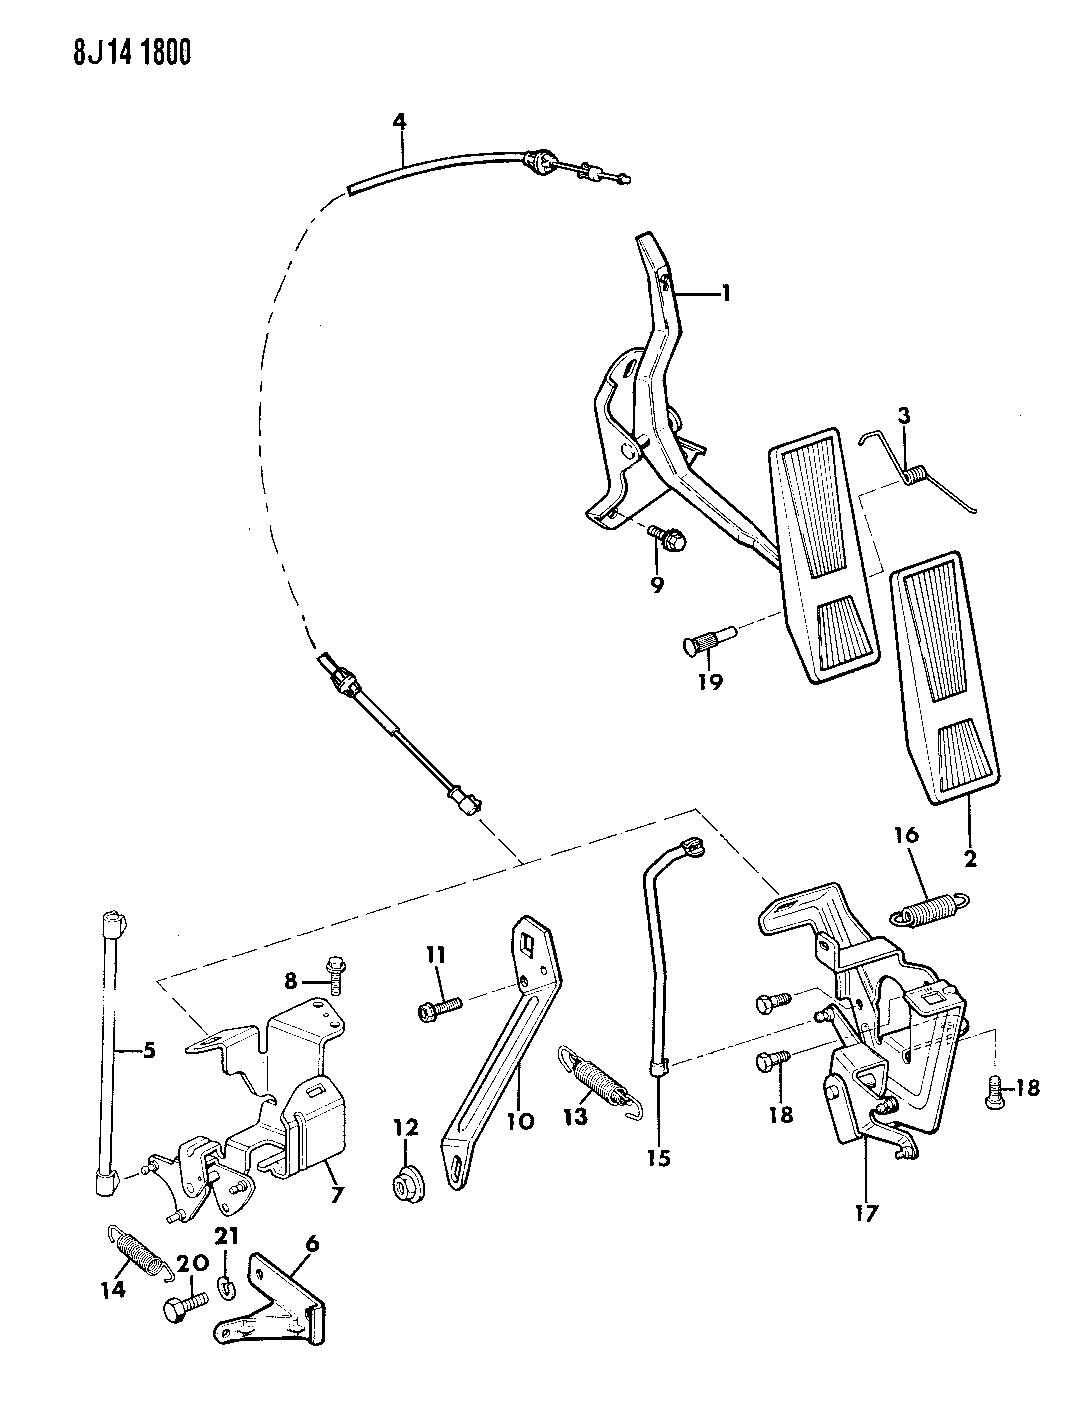 1989 Jeep Wrangler Accelerator Pedal & Linkage